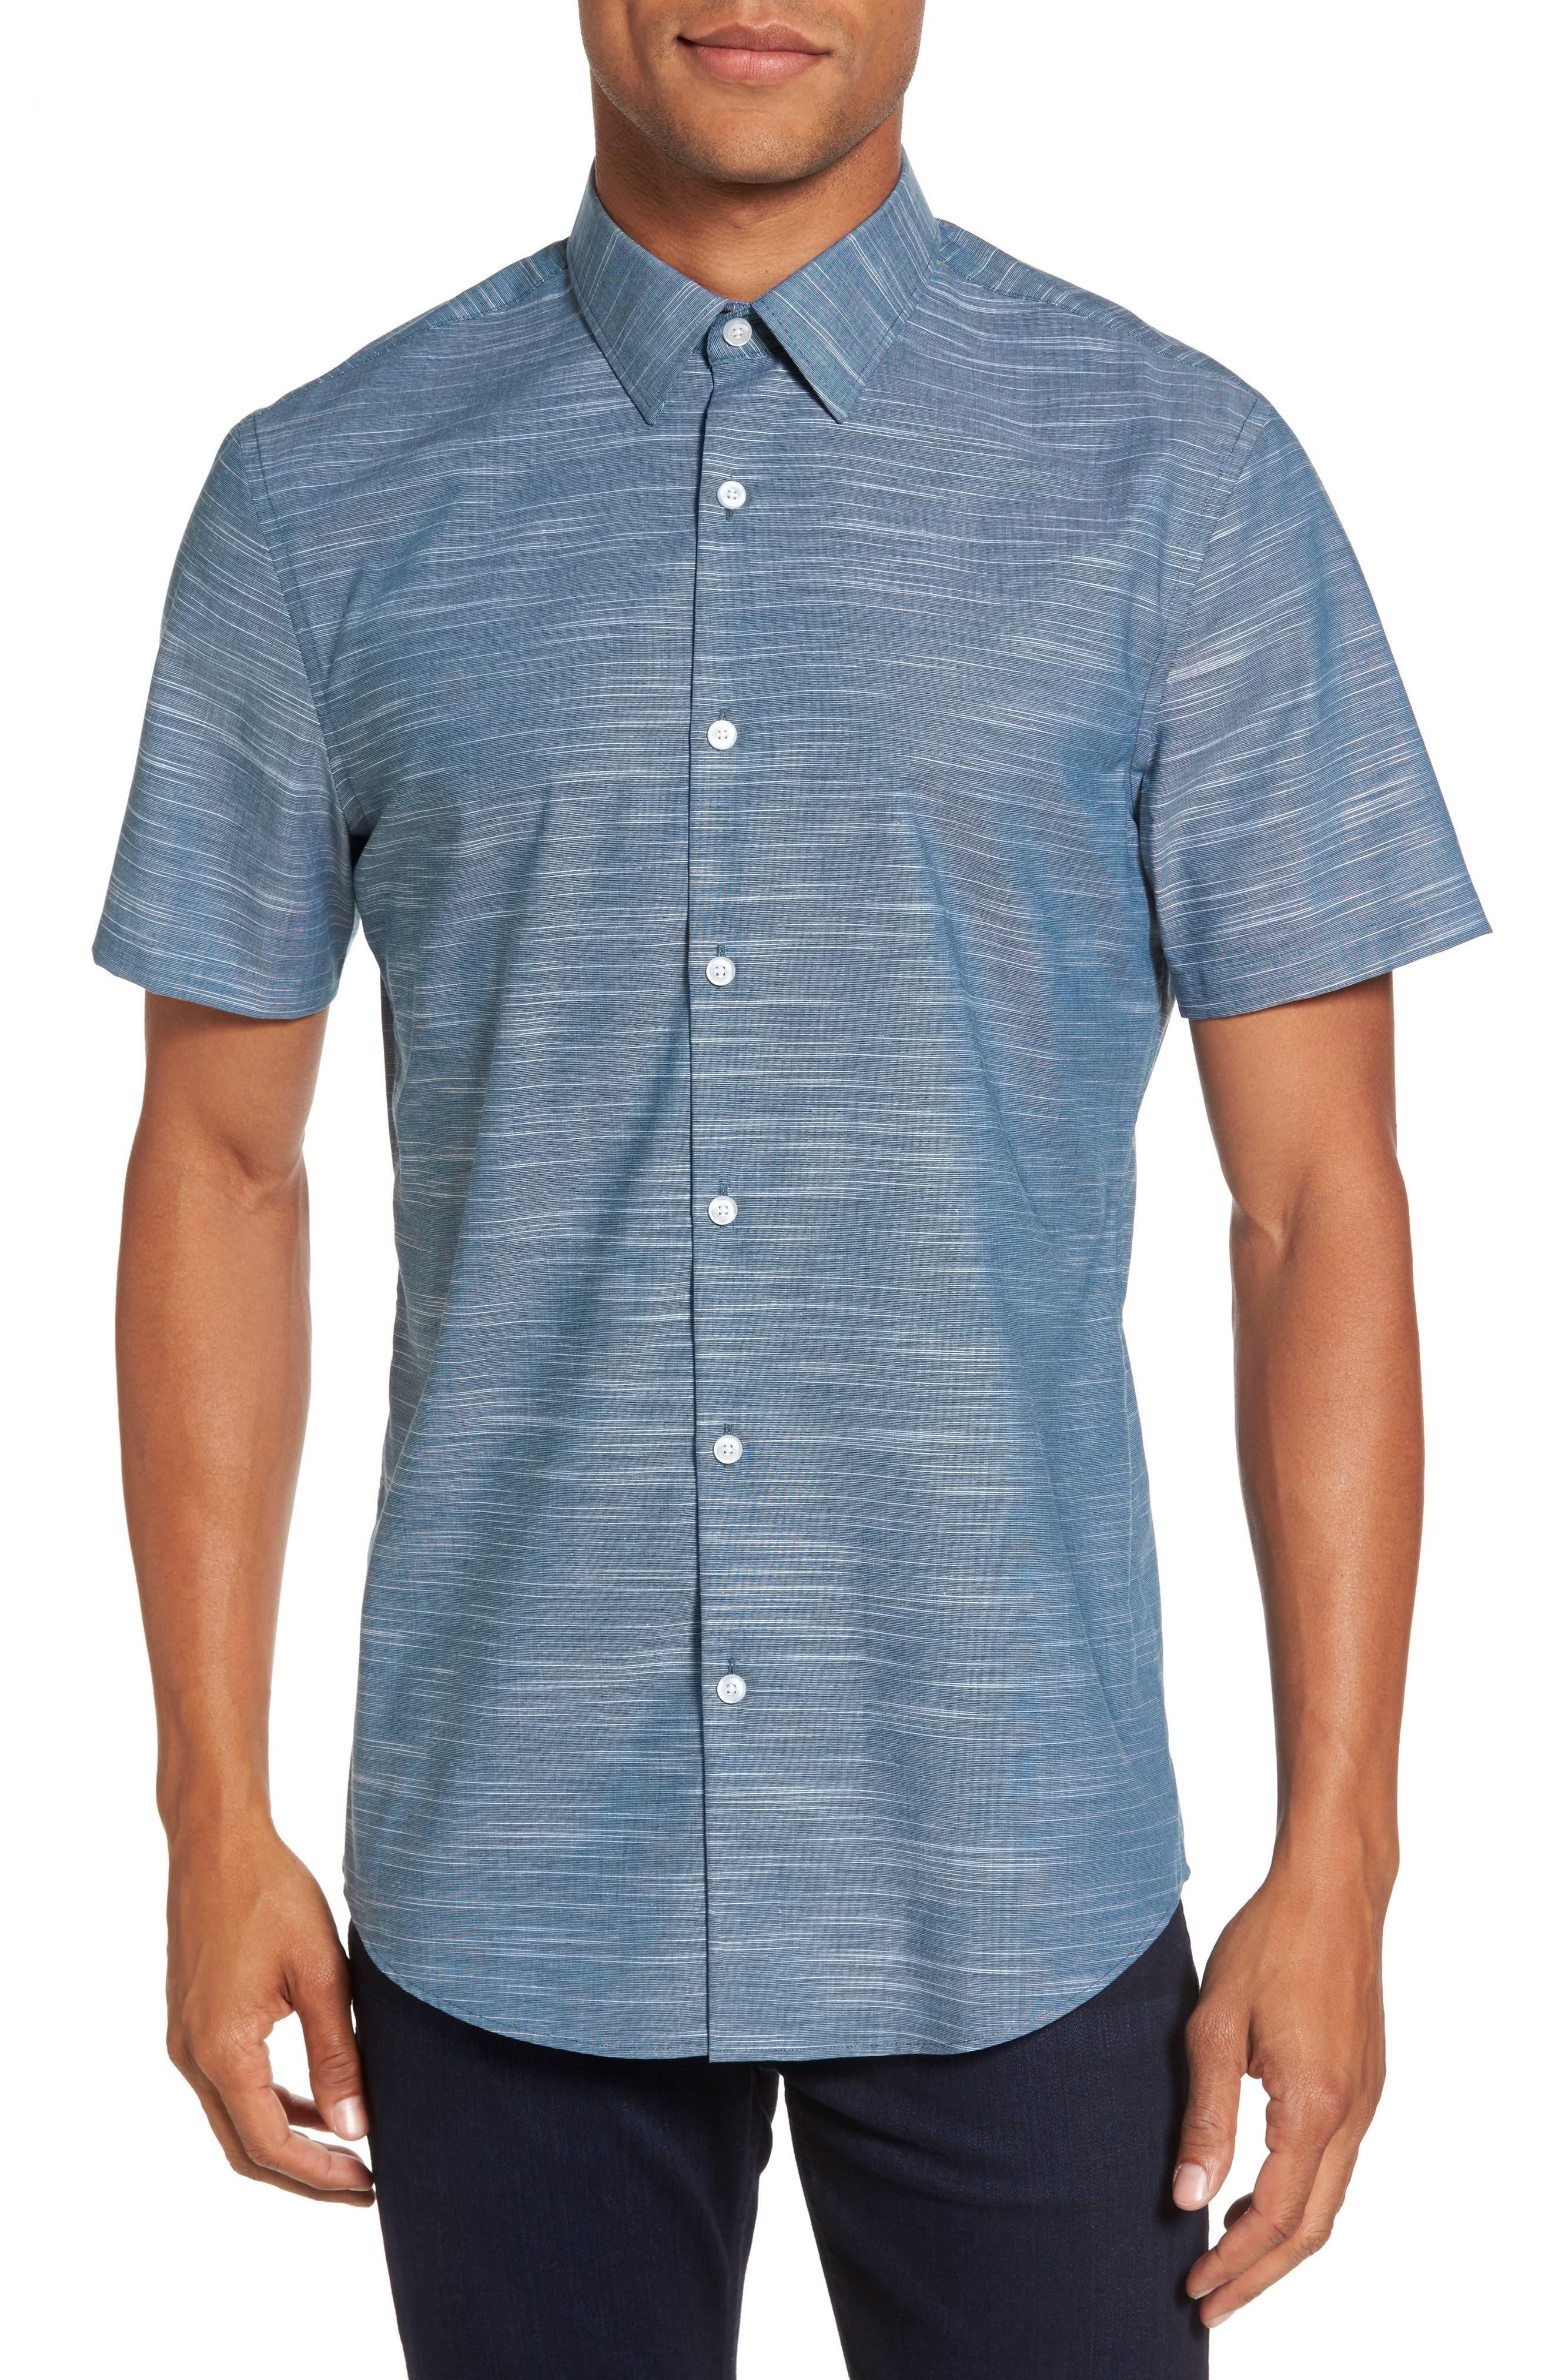 Calilbrate Slim Fit Slub Woven Shirt,                         Main,                         color, Teal Seagate Slub